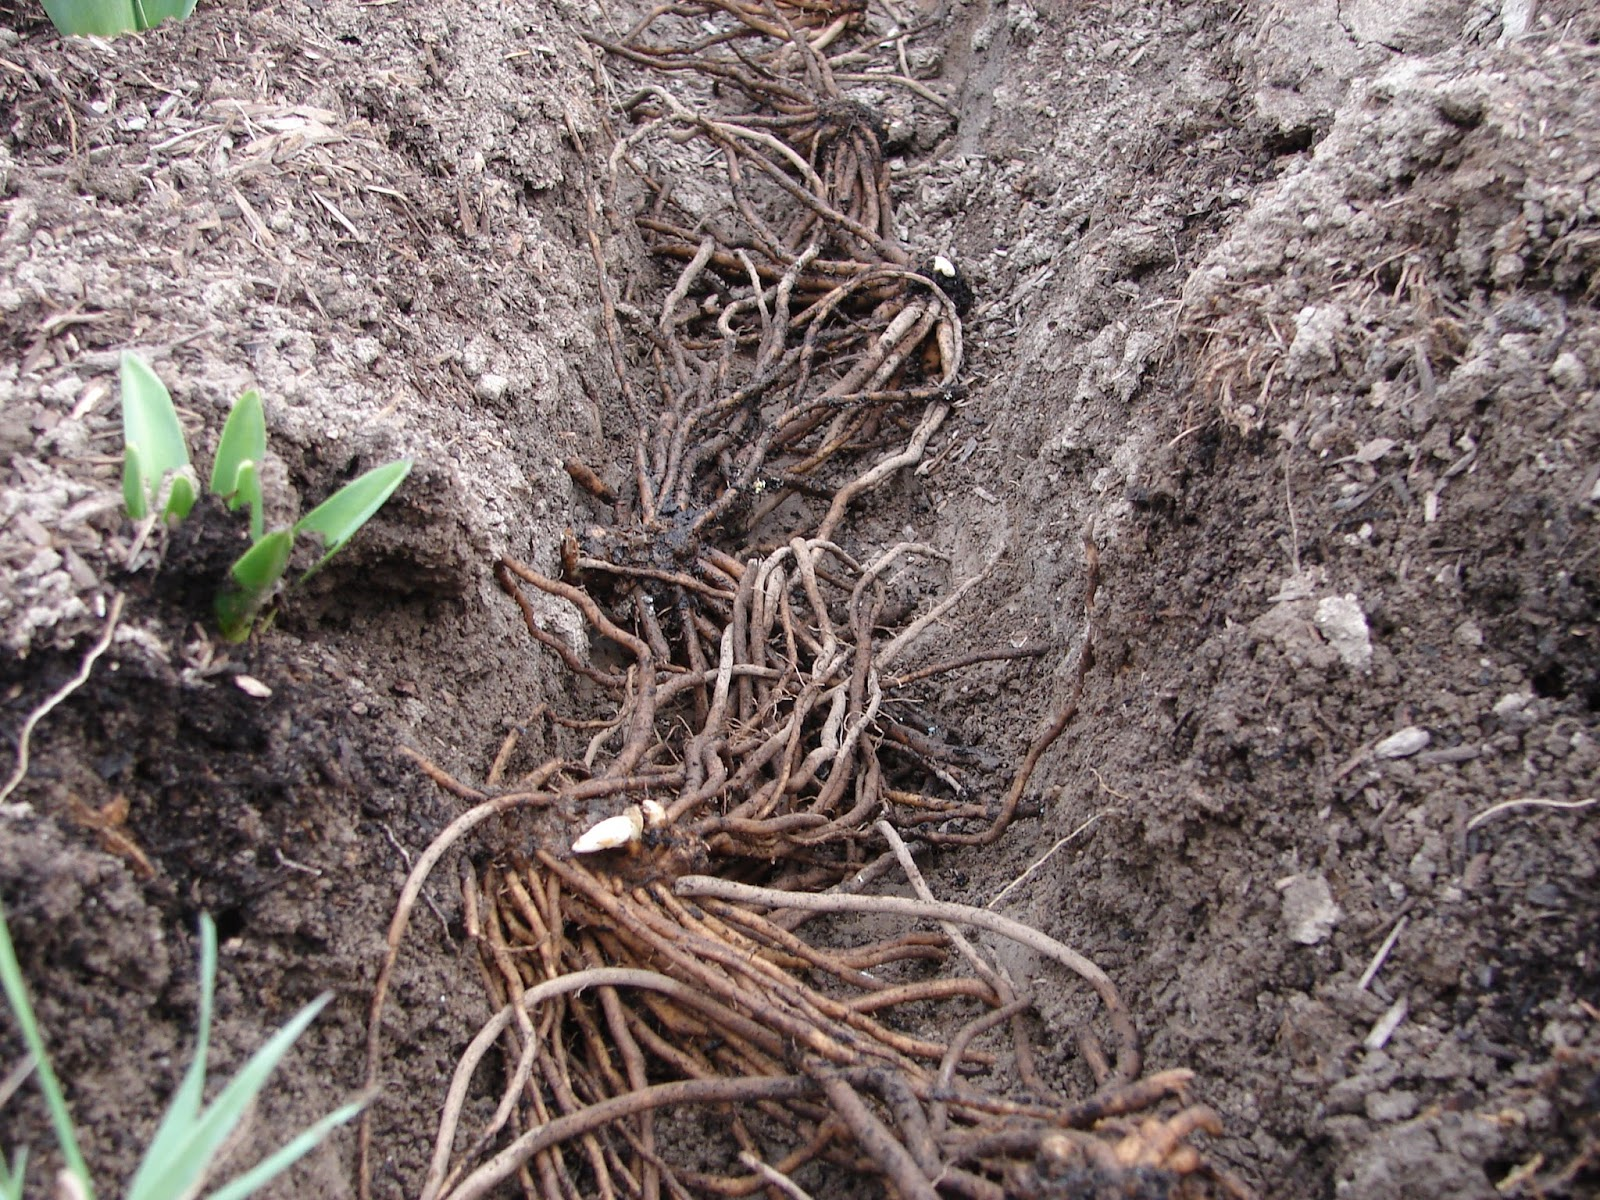 New Utah Gardener: How Do I Plant Asparagus? Planting Asparagus In The Fall